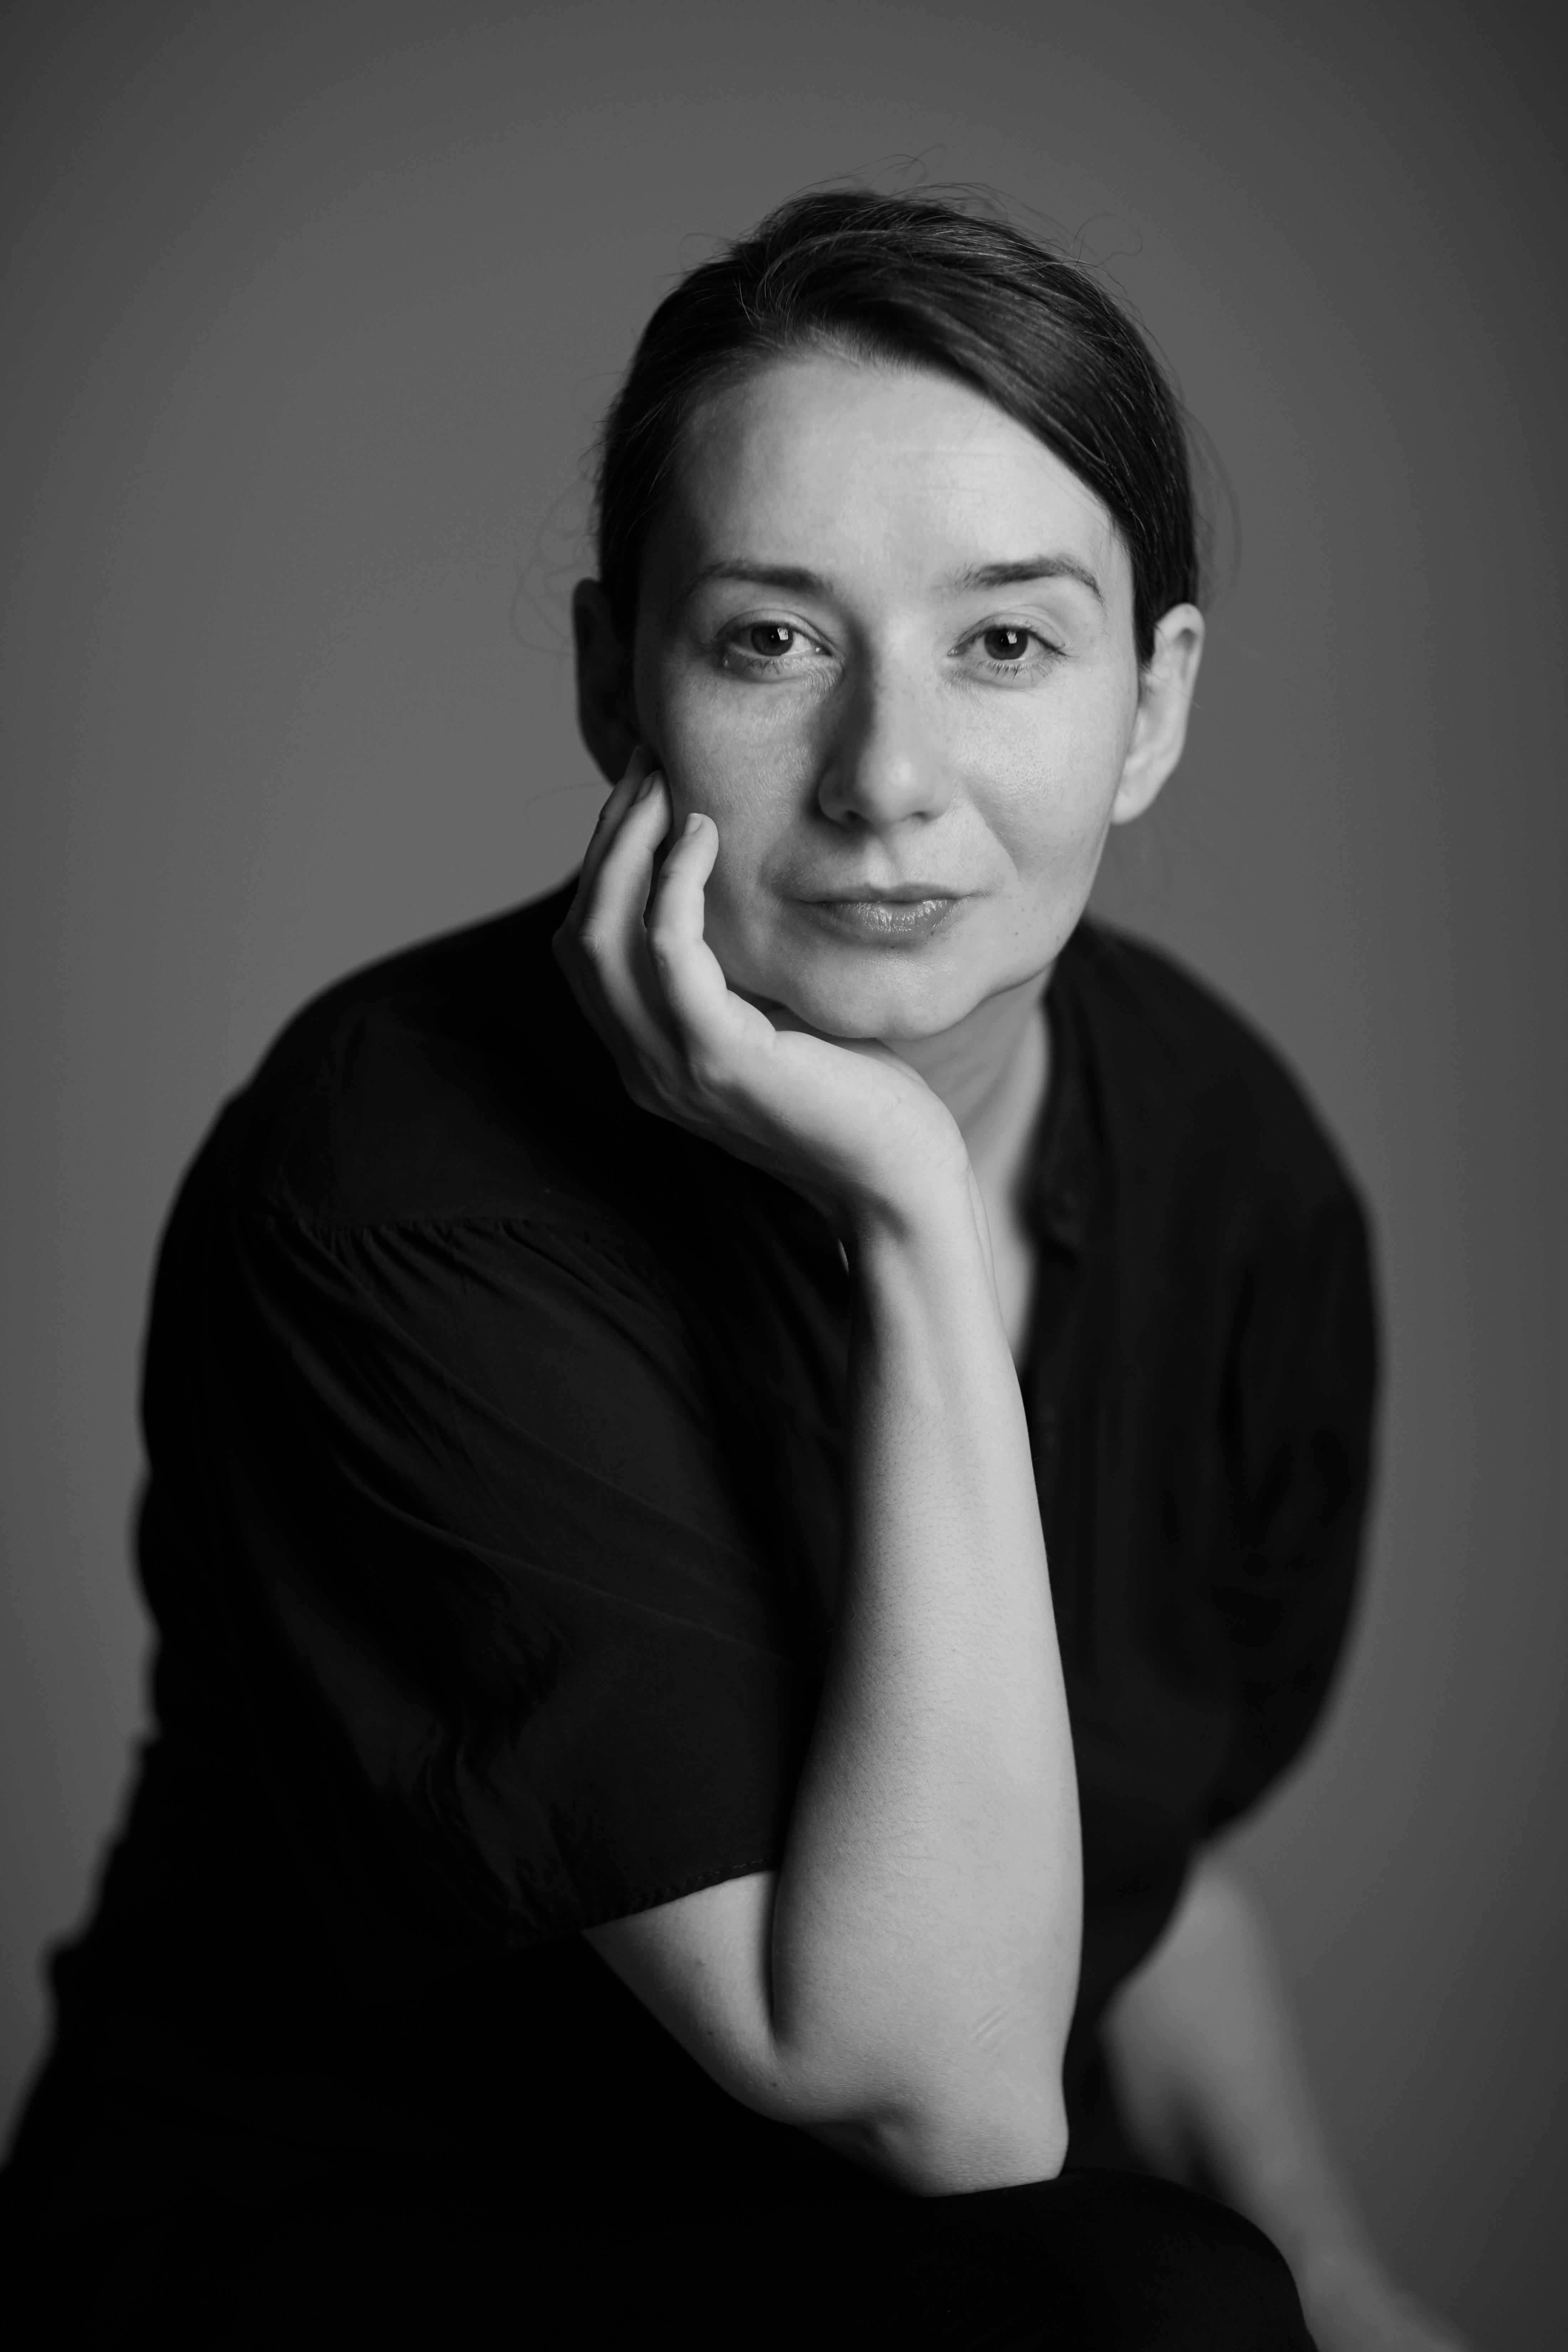 Zuzana Konecna